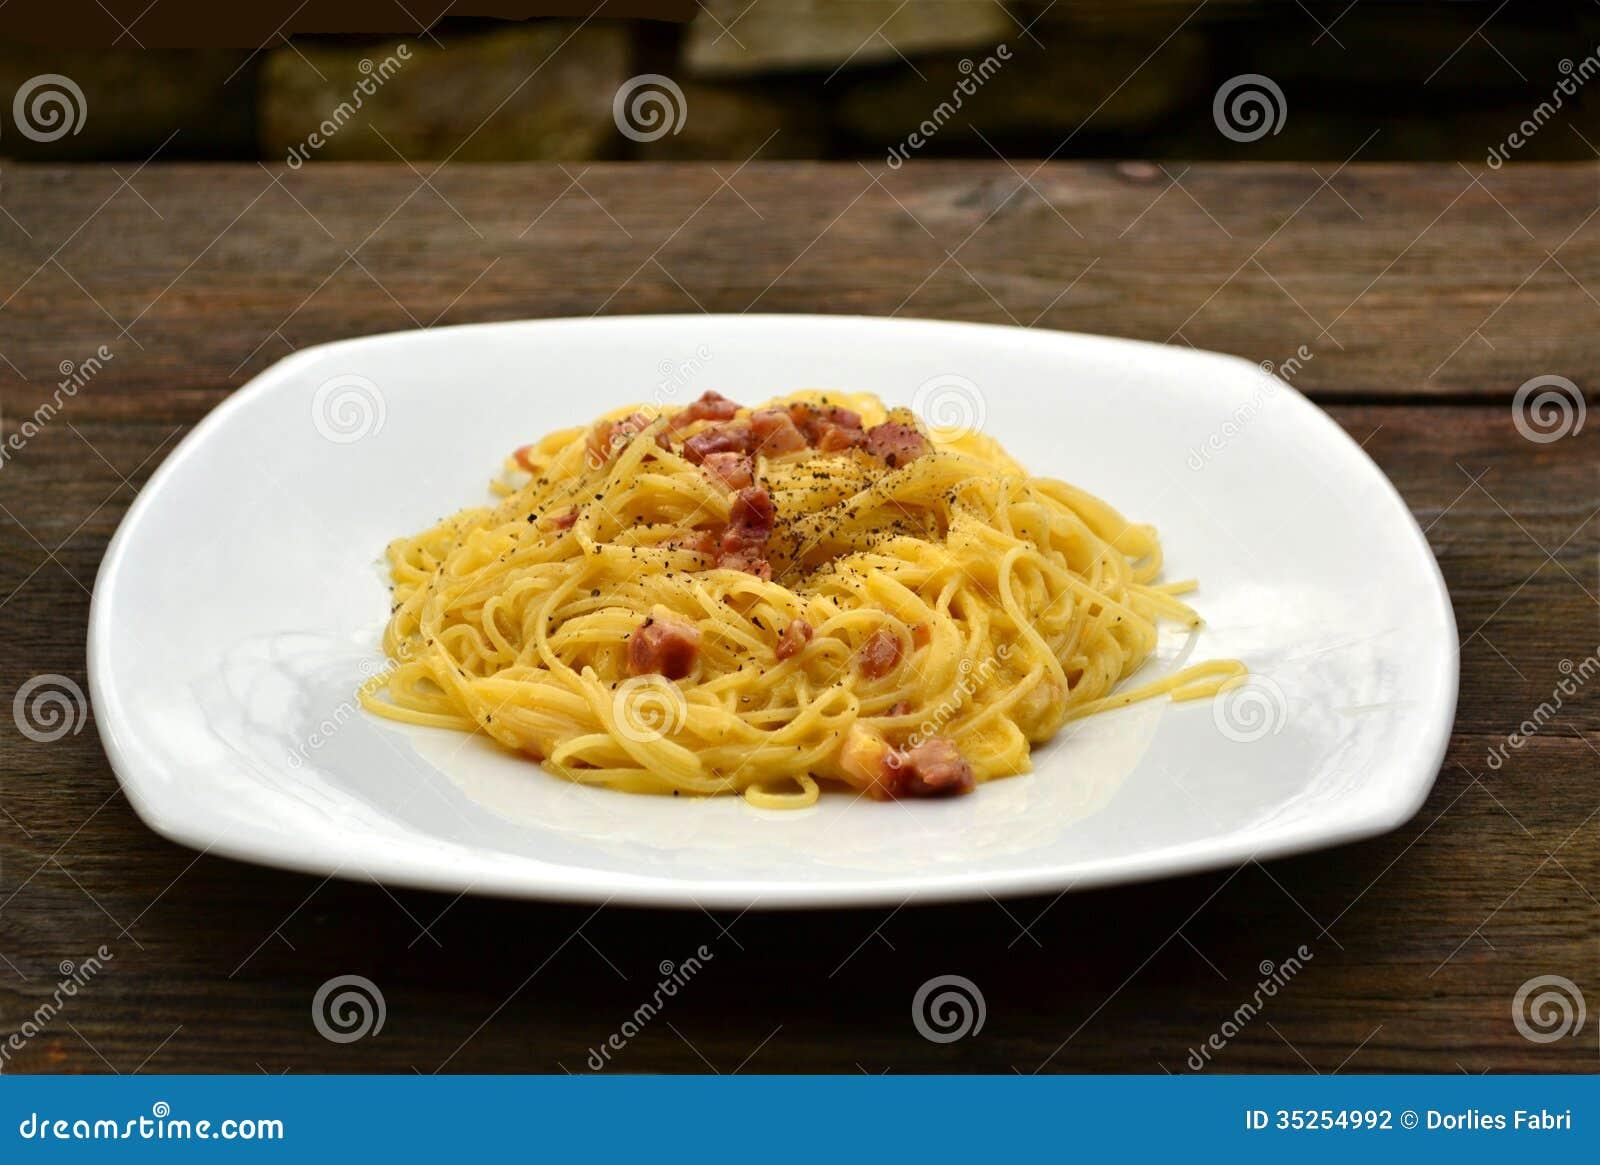 Pasta carbonara stock photography image 35254992 for Pasta romana